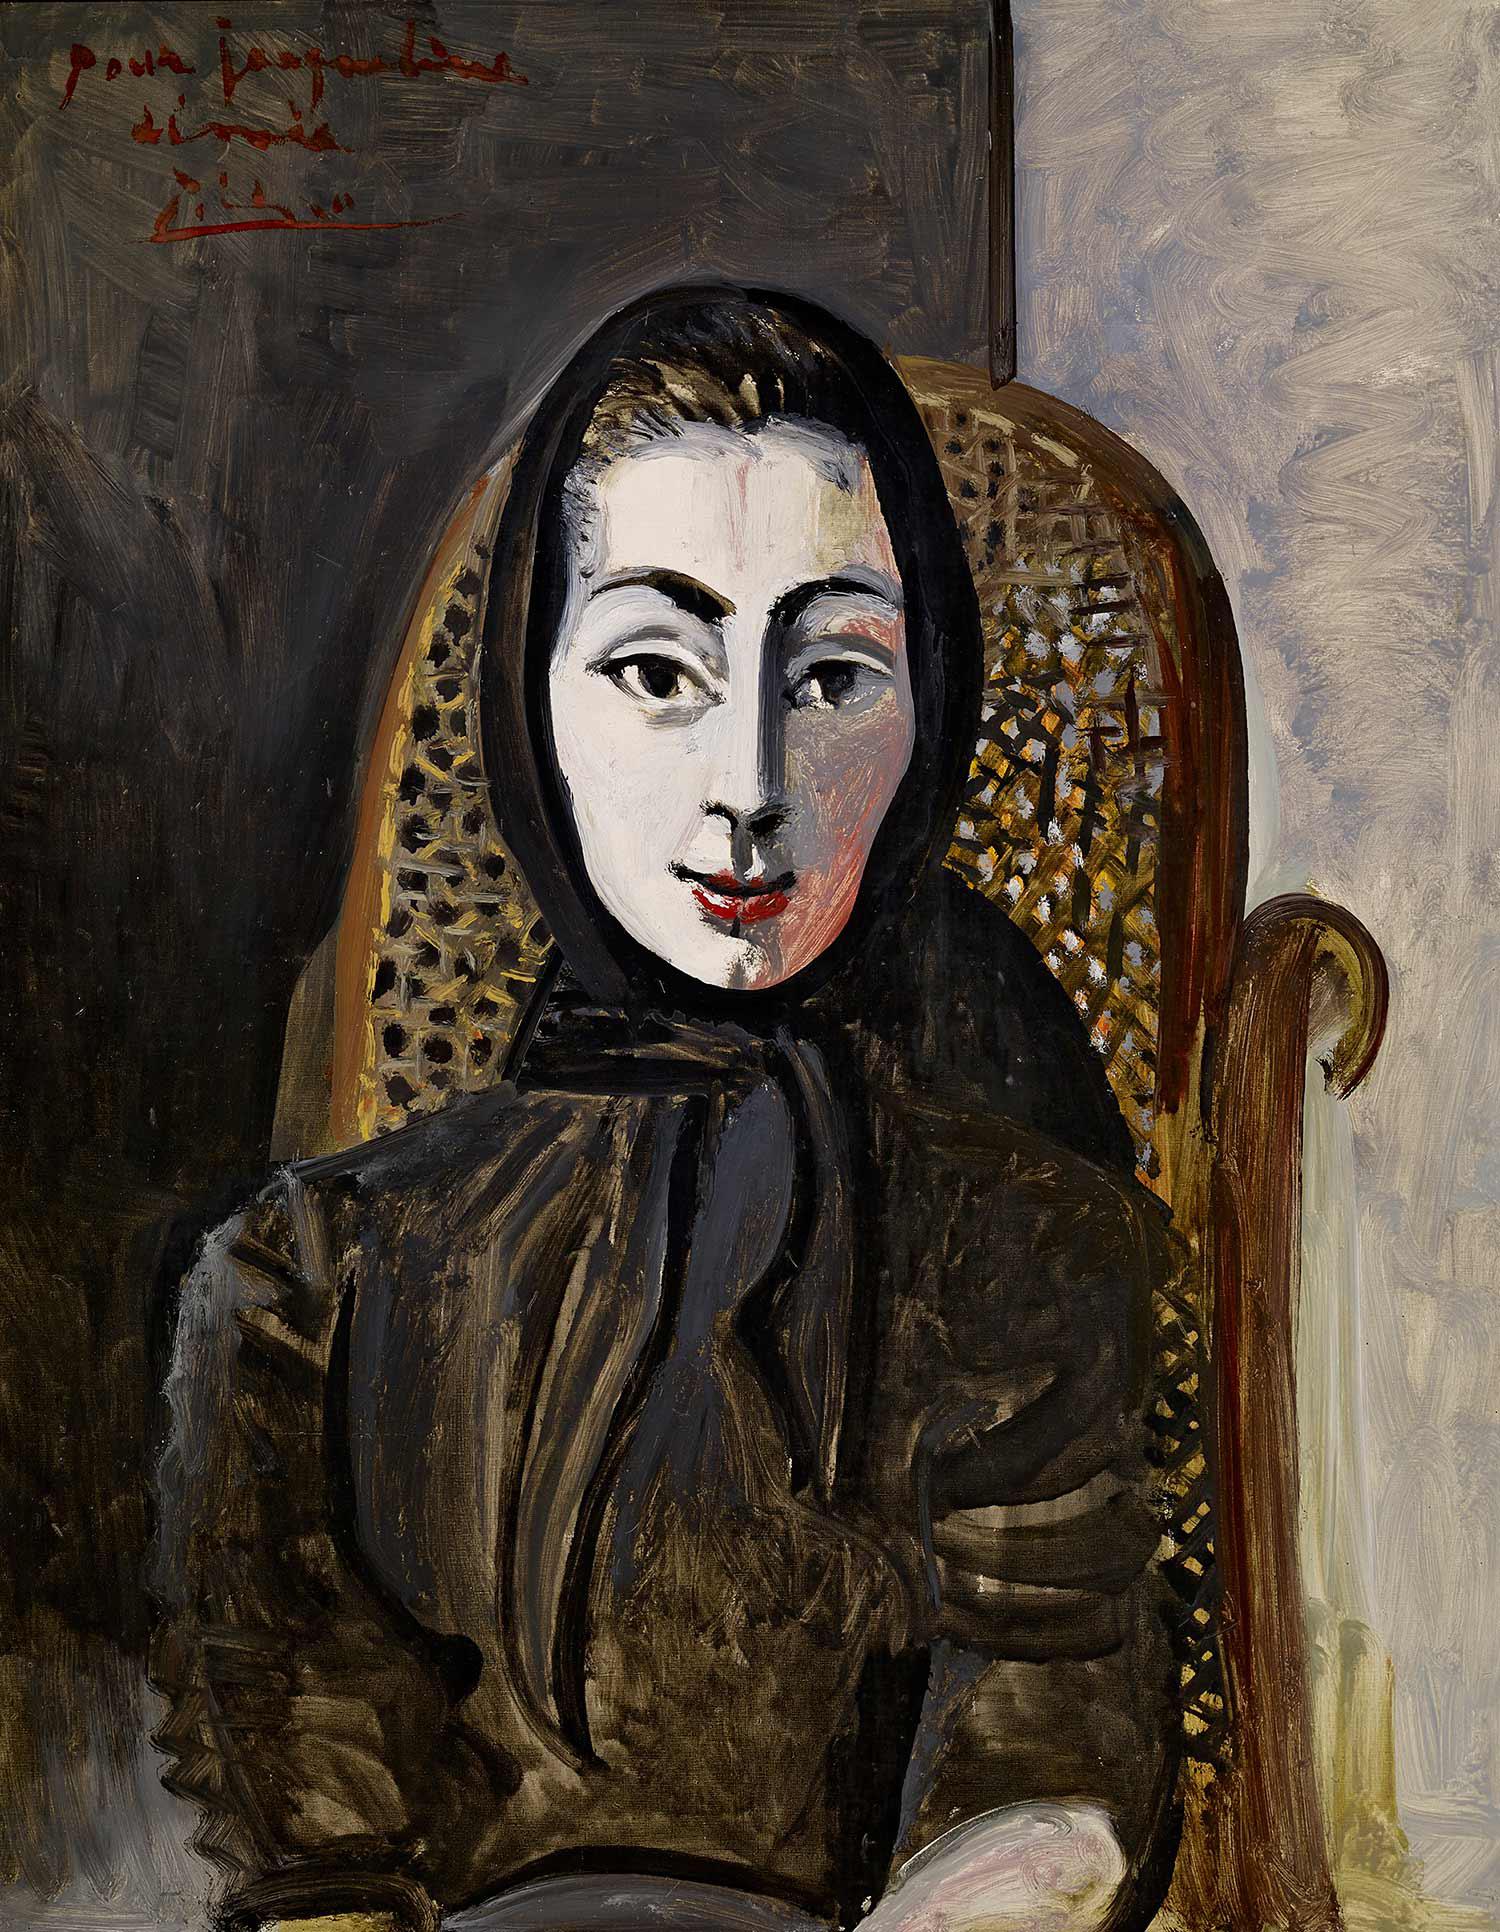 Pablo Picasso, 'Portrait of Jacqueline in a Black Scarf',